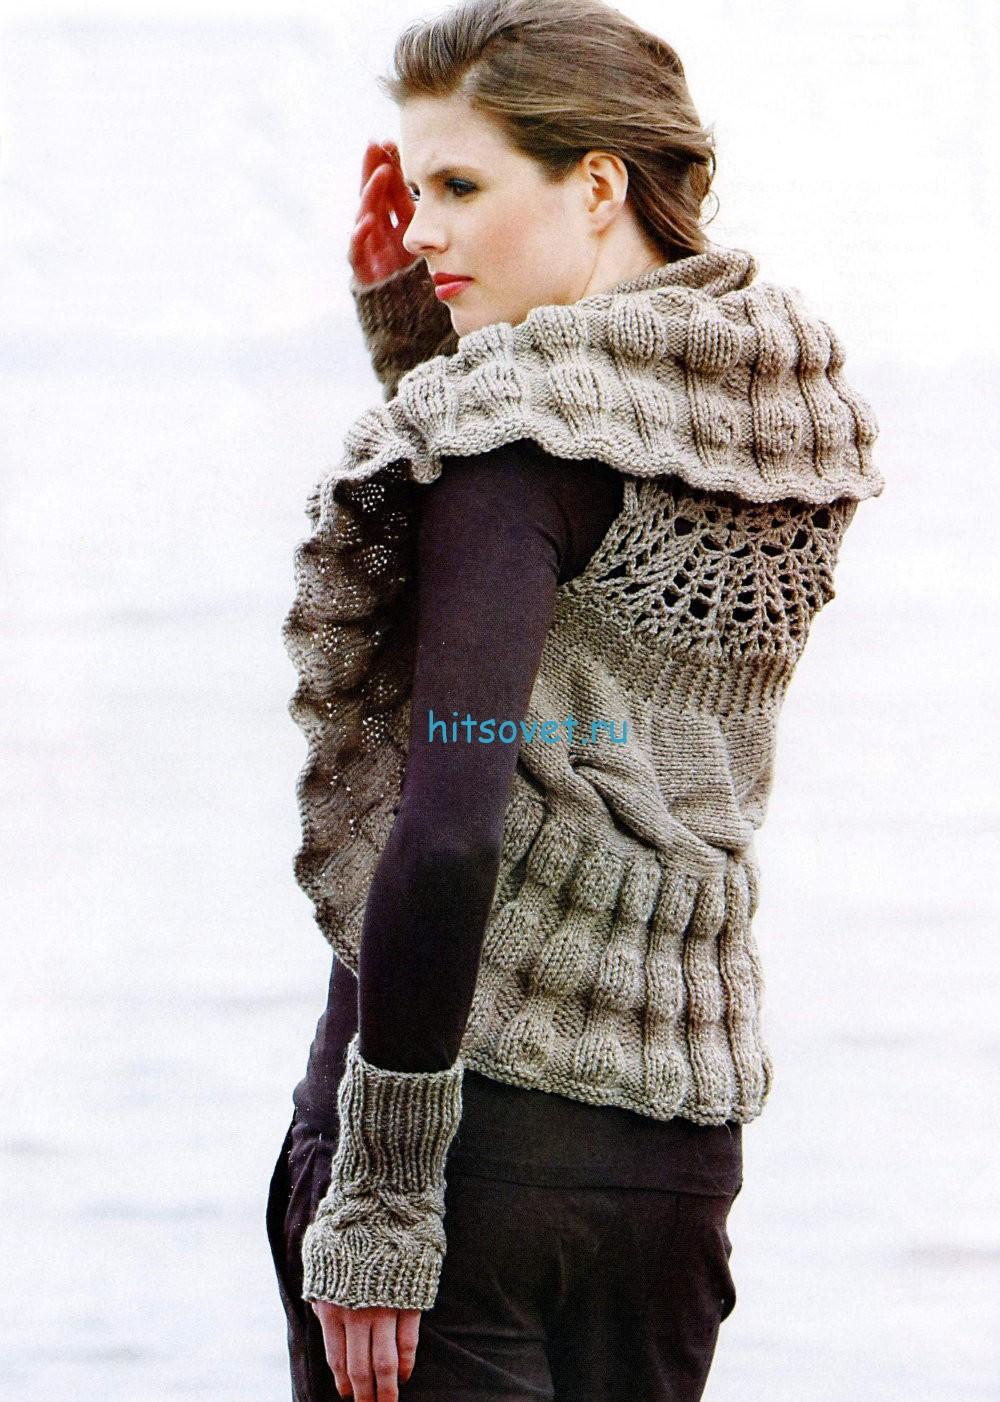 Вязание жилет спицами и митенки